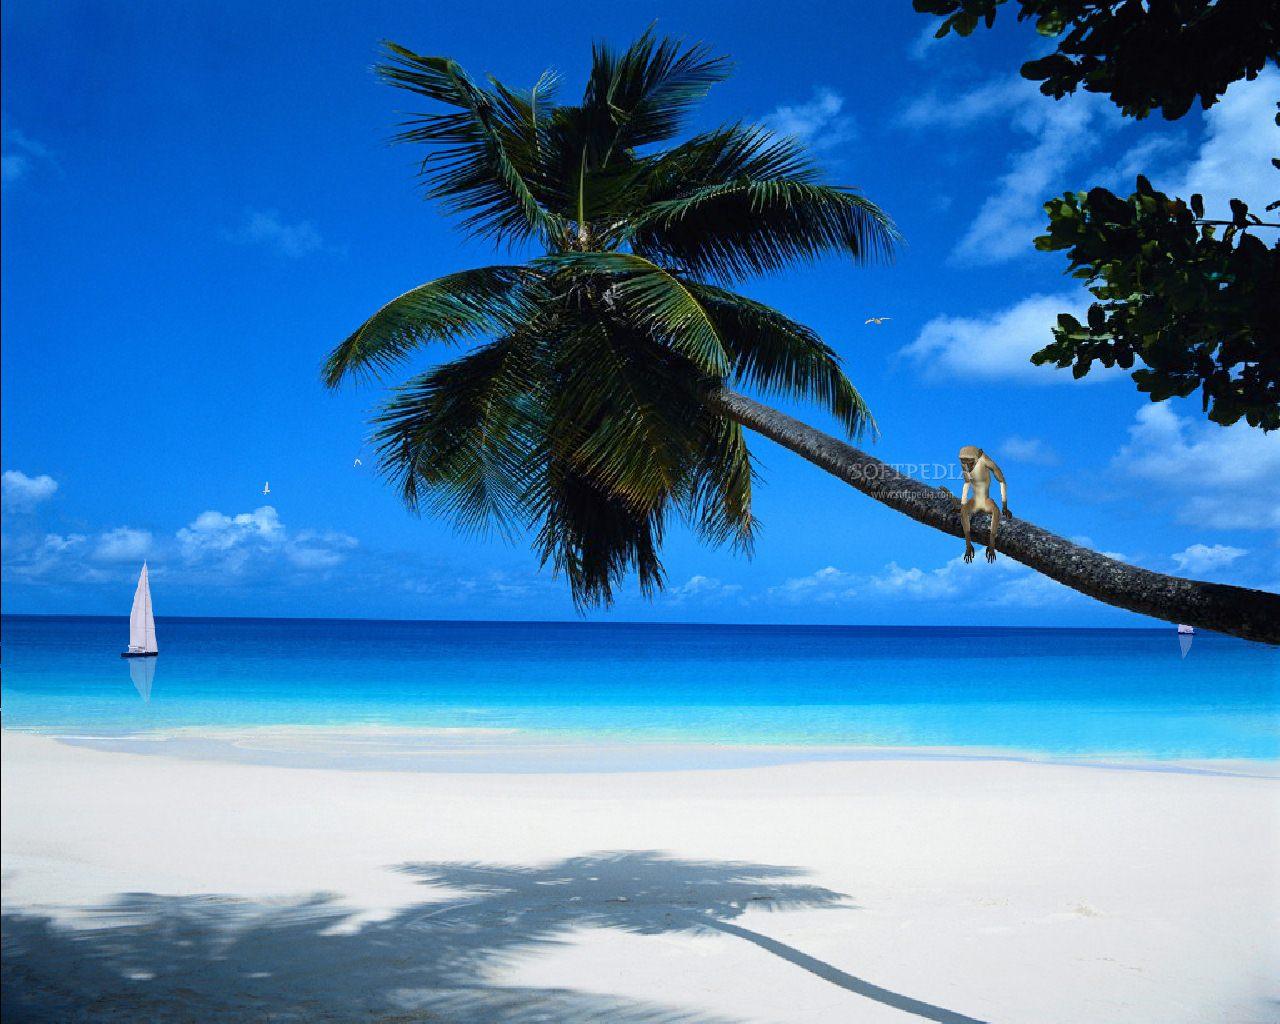 Paradise Wallpaper Desktop 8165 Hd Wallpapers in Beach   Imagescicom 1280x1024